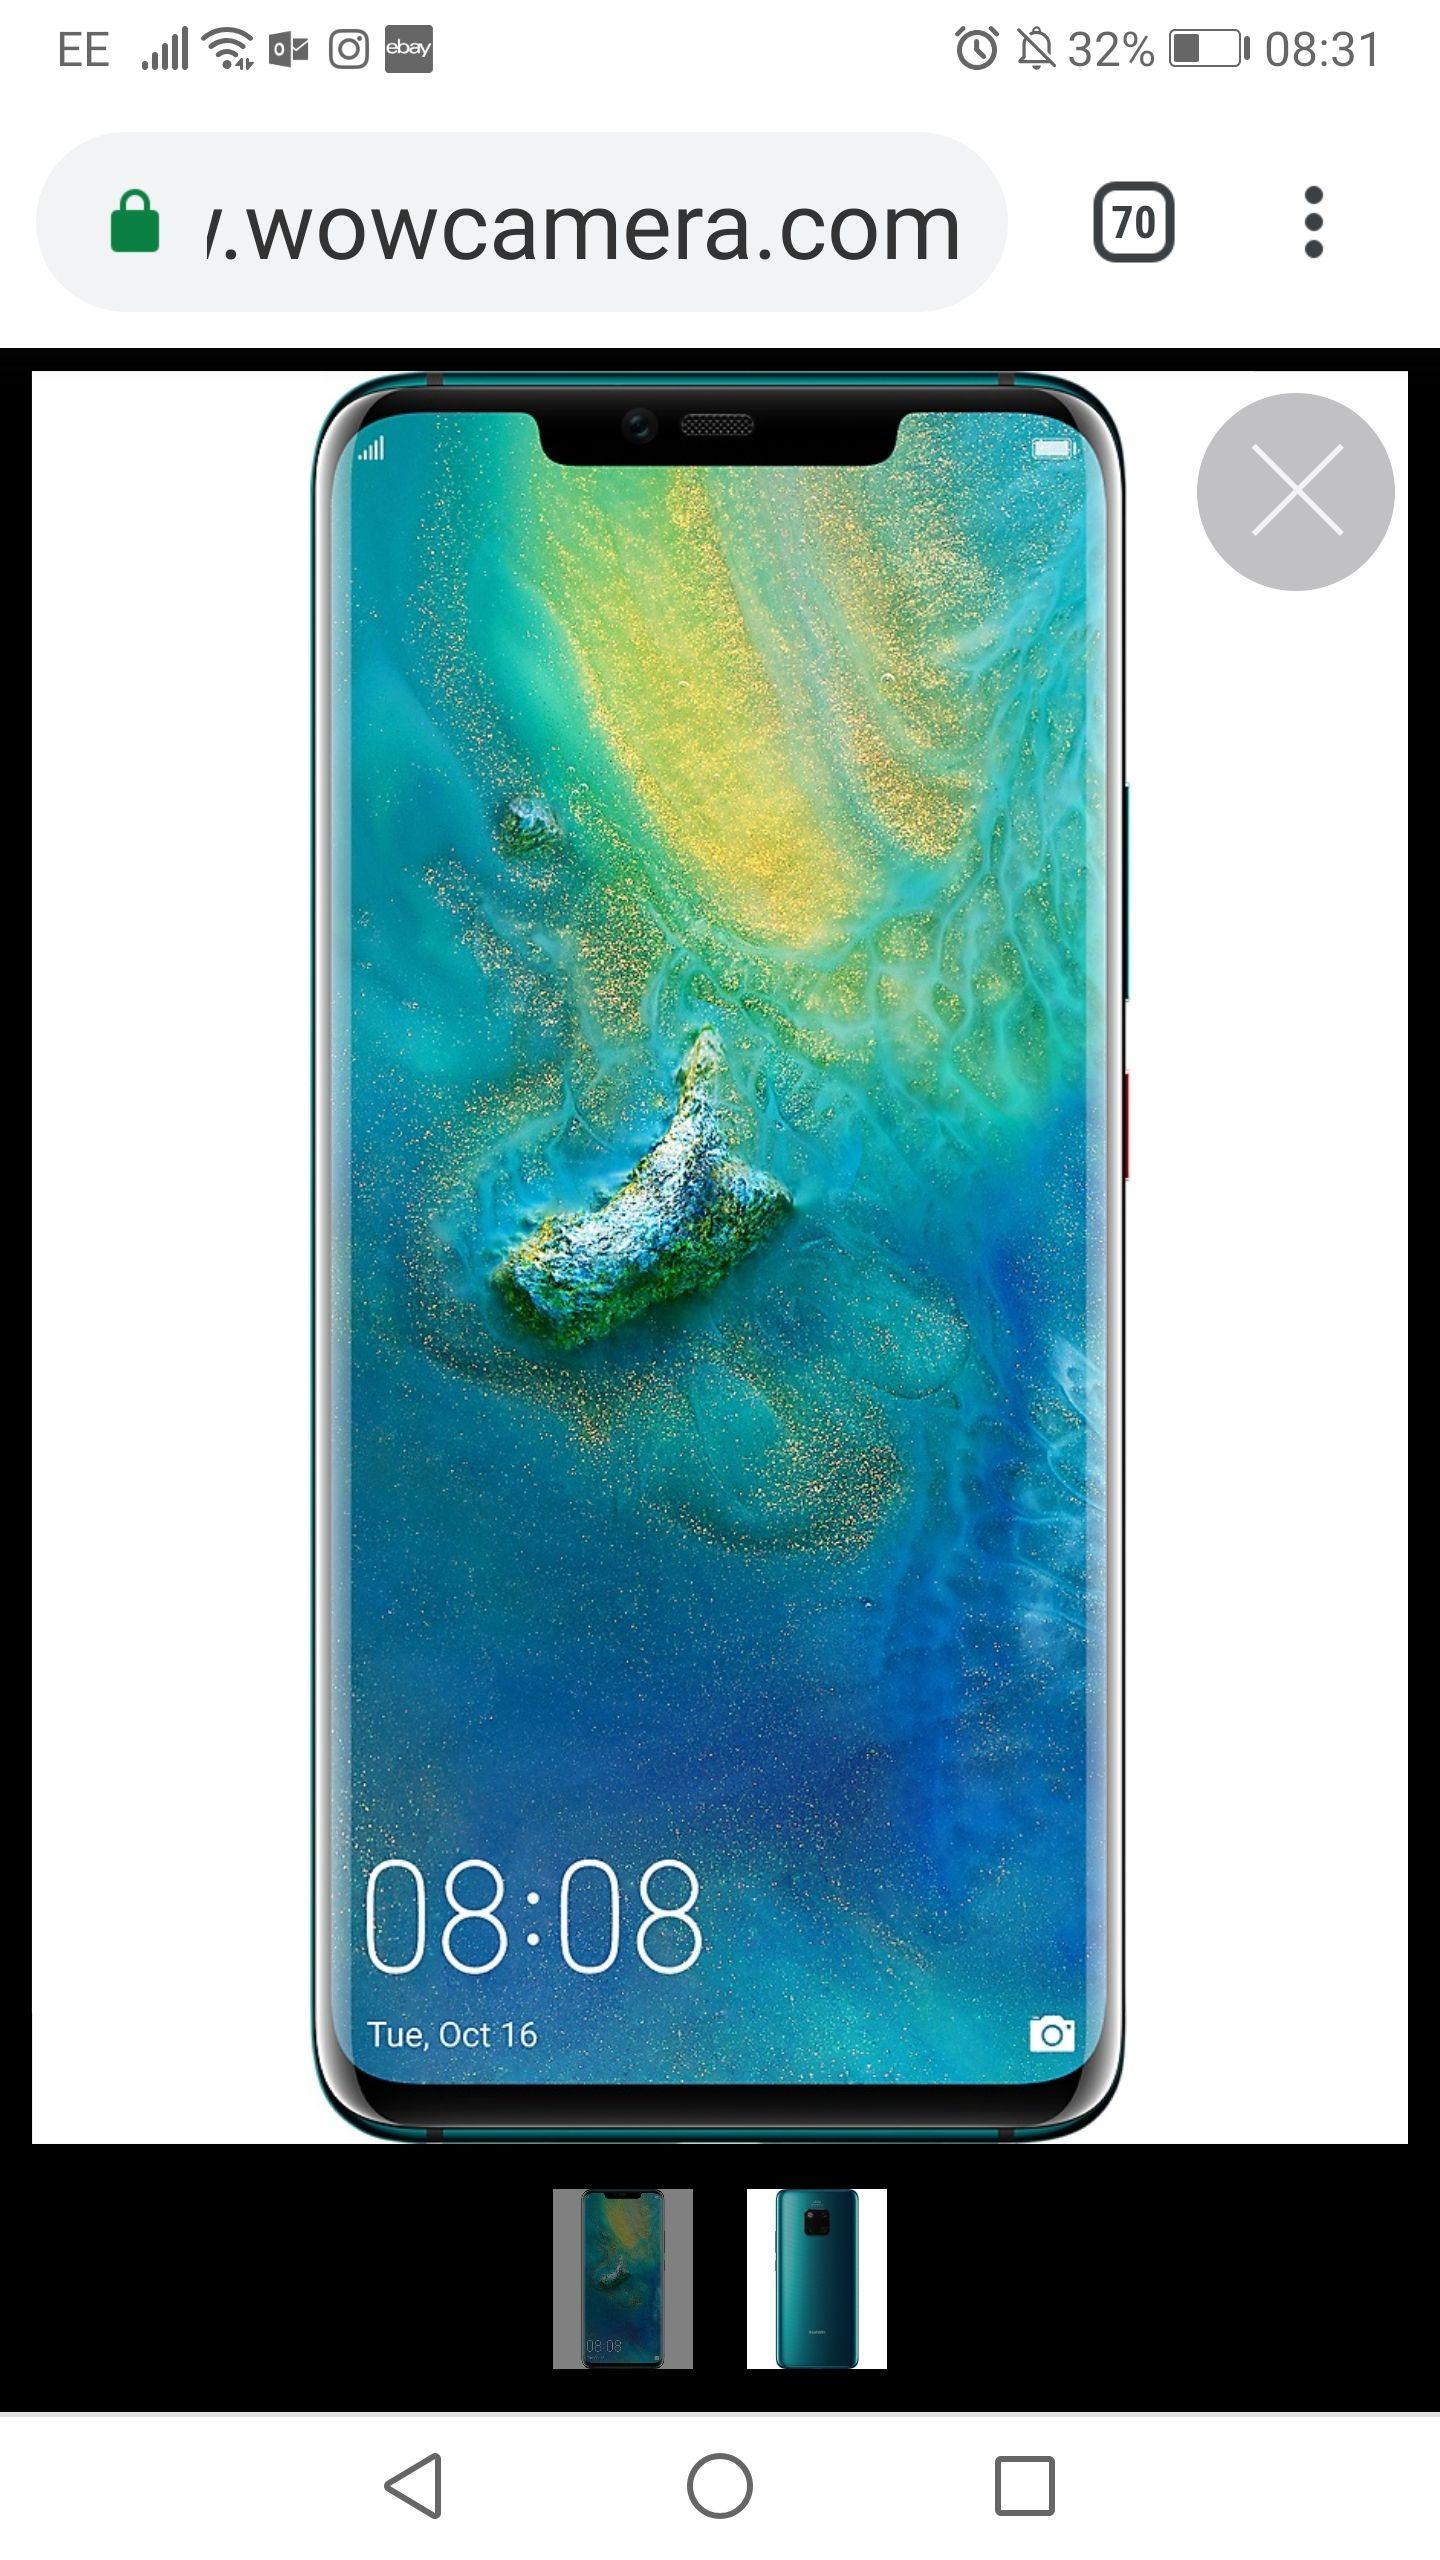 Cheapest ever! New Huawei mate 20 Pro. Unlocked, dual SIM,  2 years official Huawei UK warranty. 14 day money back guarantee £580 Wowcamera